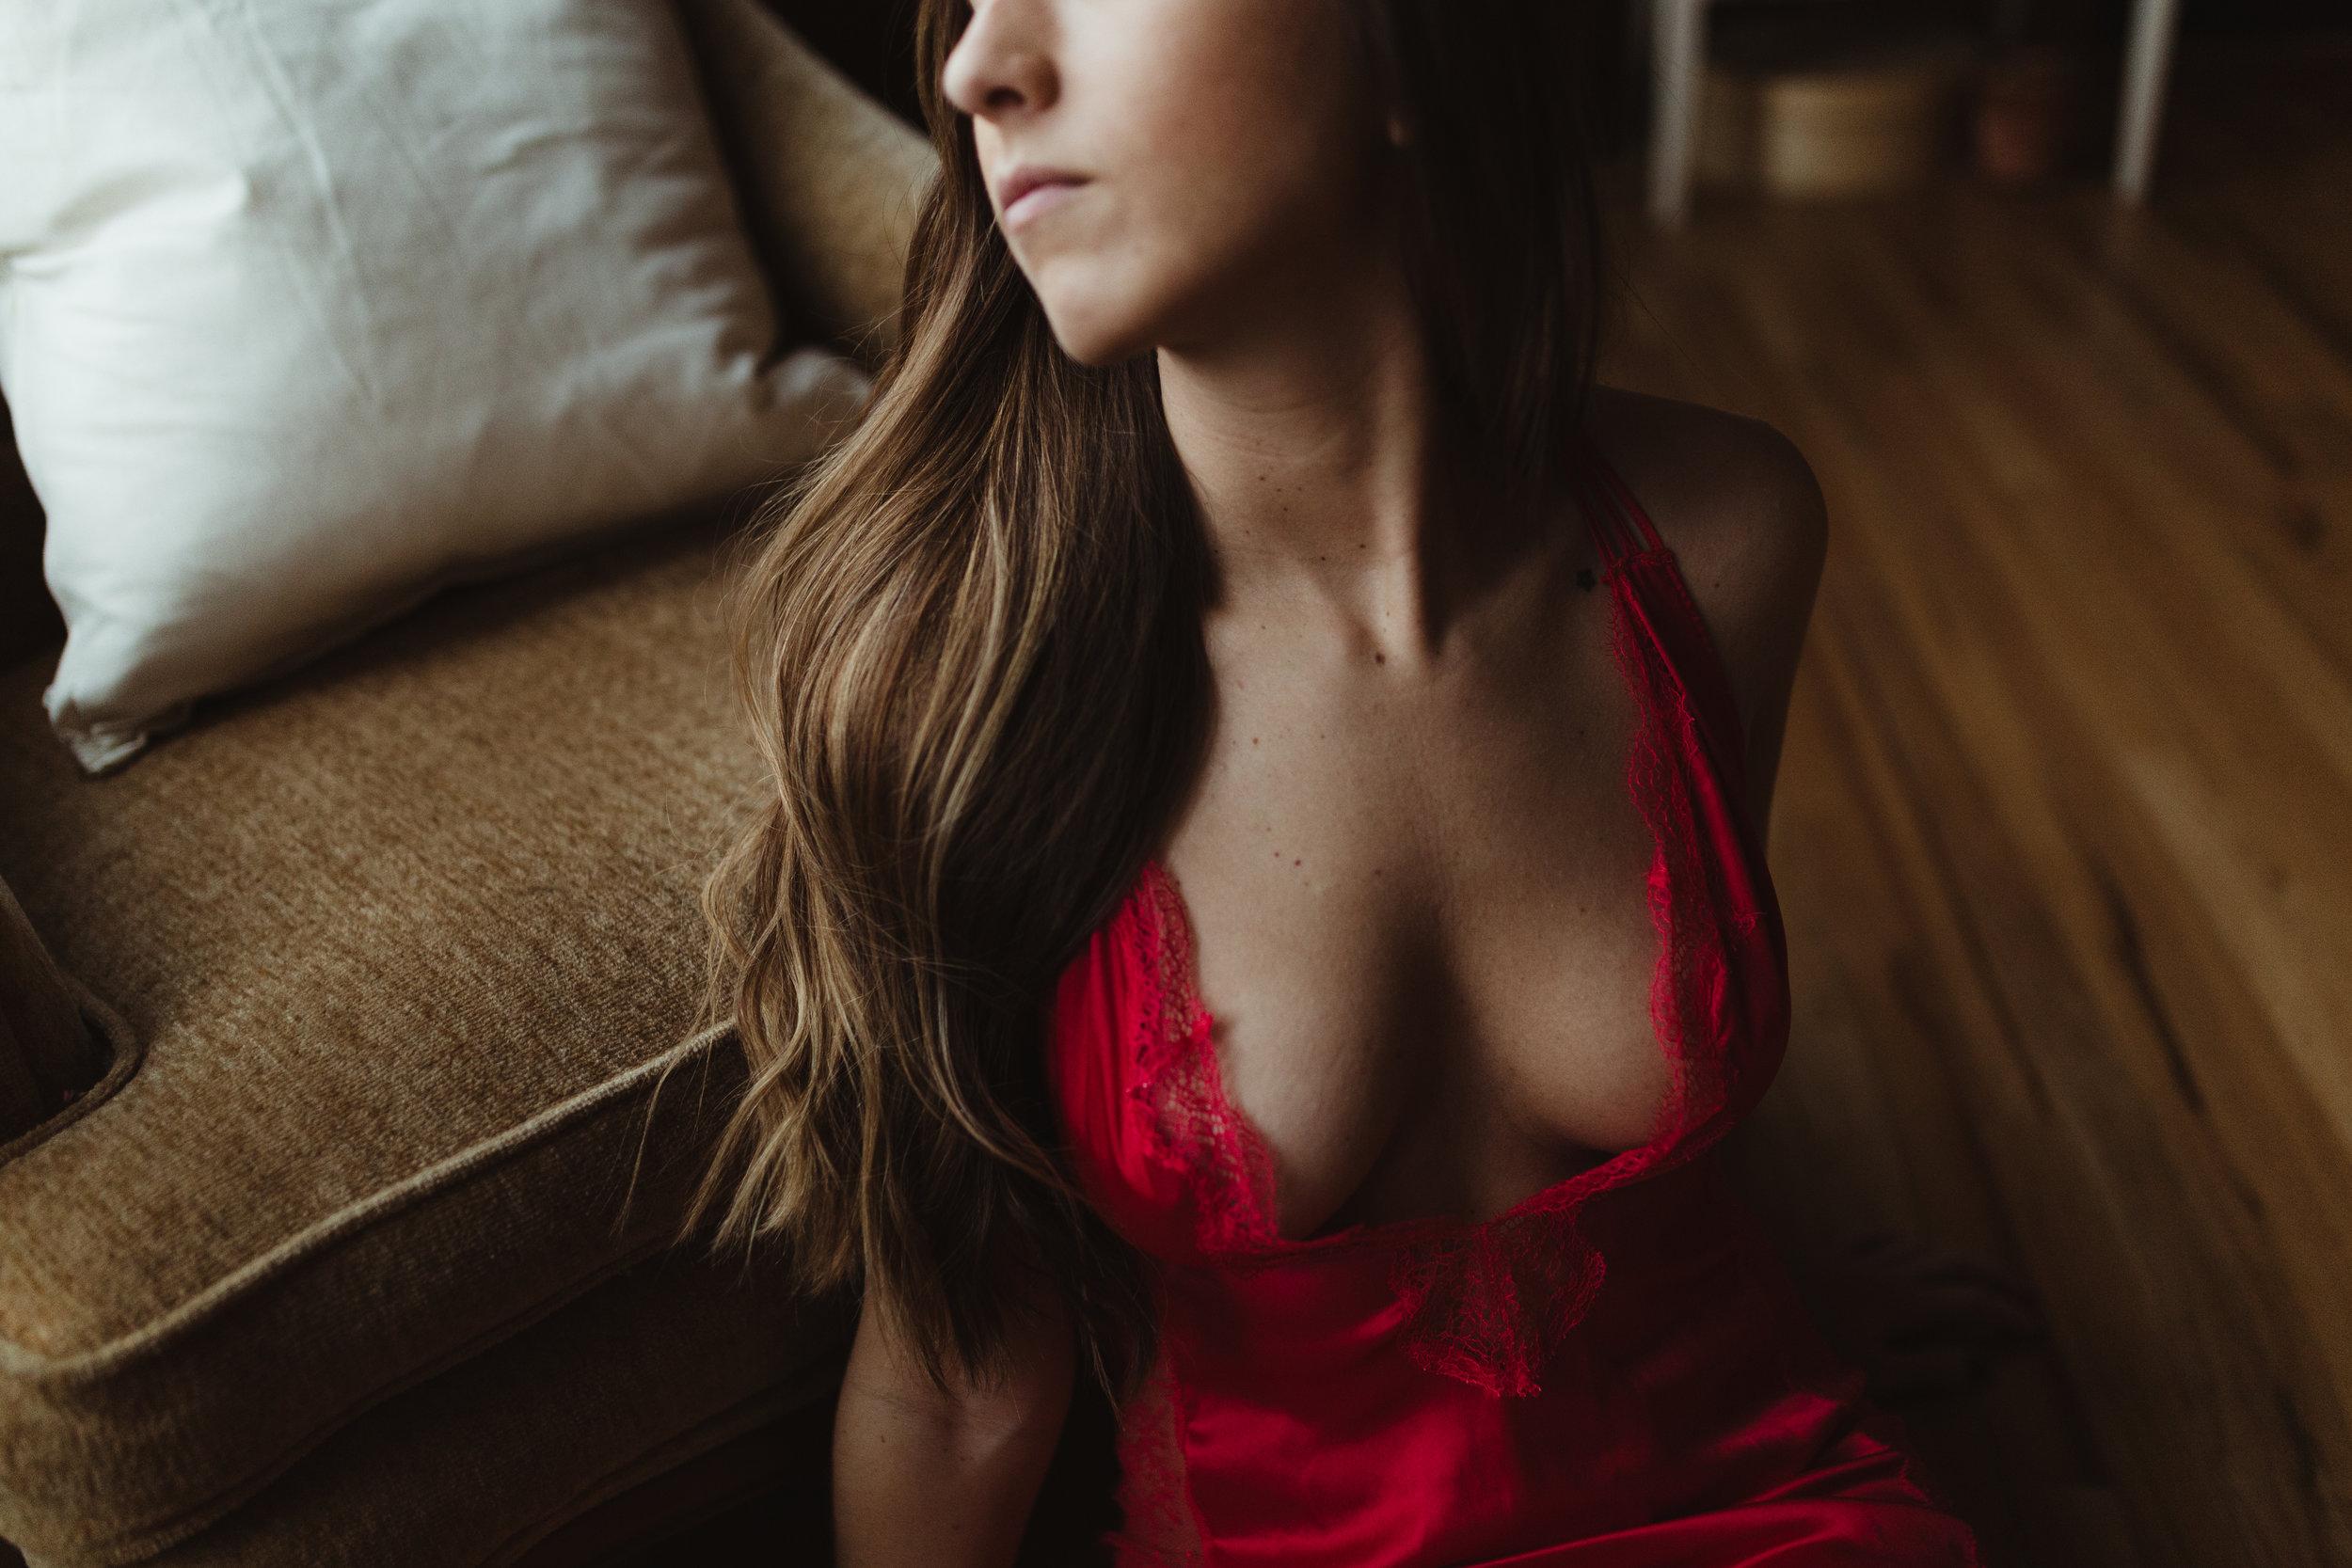 michigan-boudoir-photographer-ludington-intimate-portraiture-short-sessions-jessica-max-2823.jpg